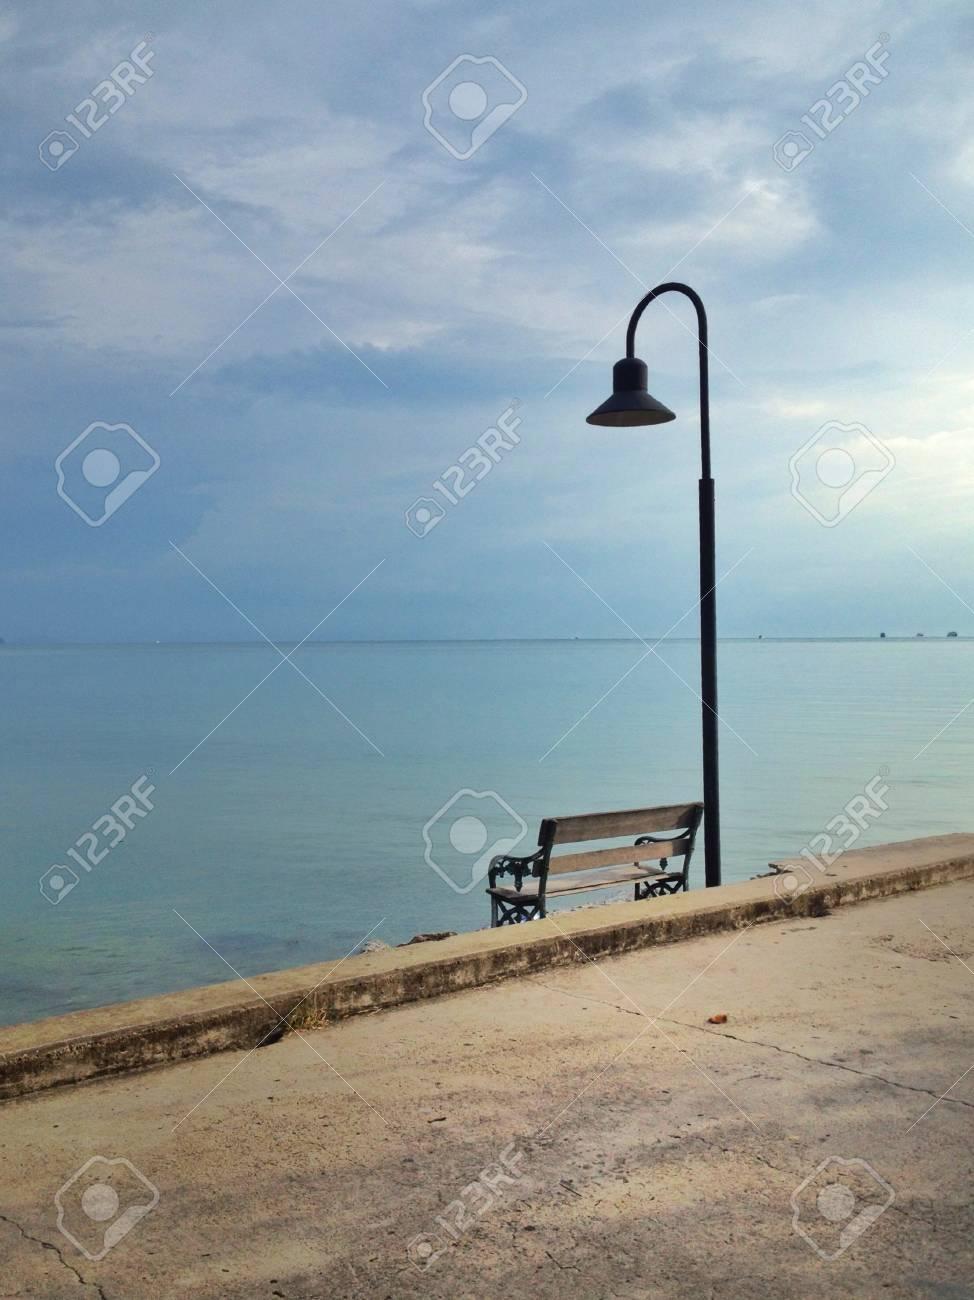 Chair on the beach. Stock Photo - 20625179